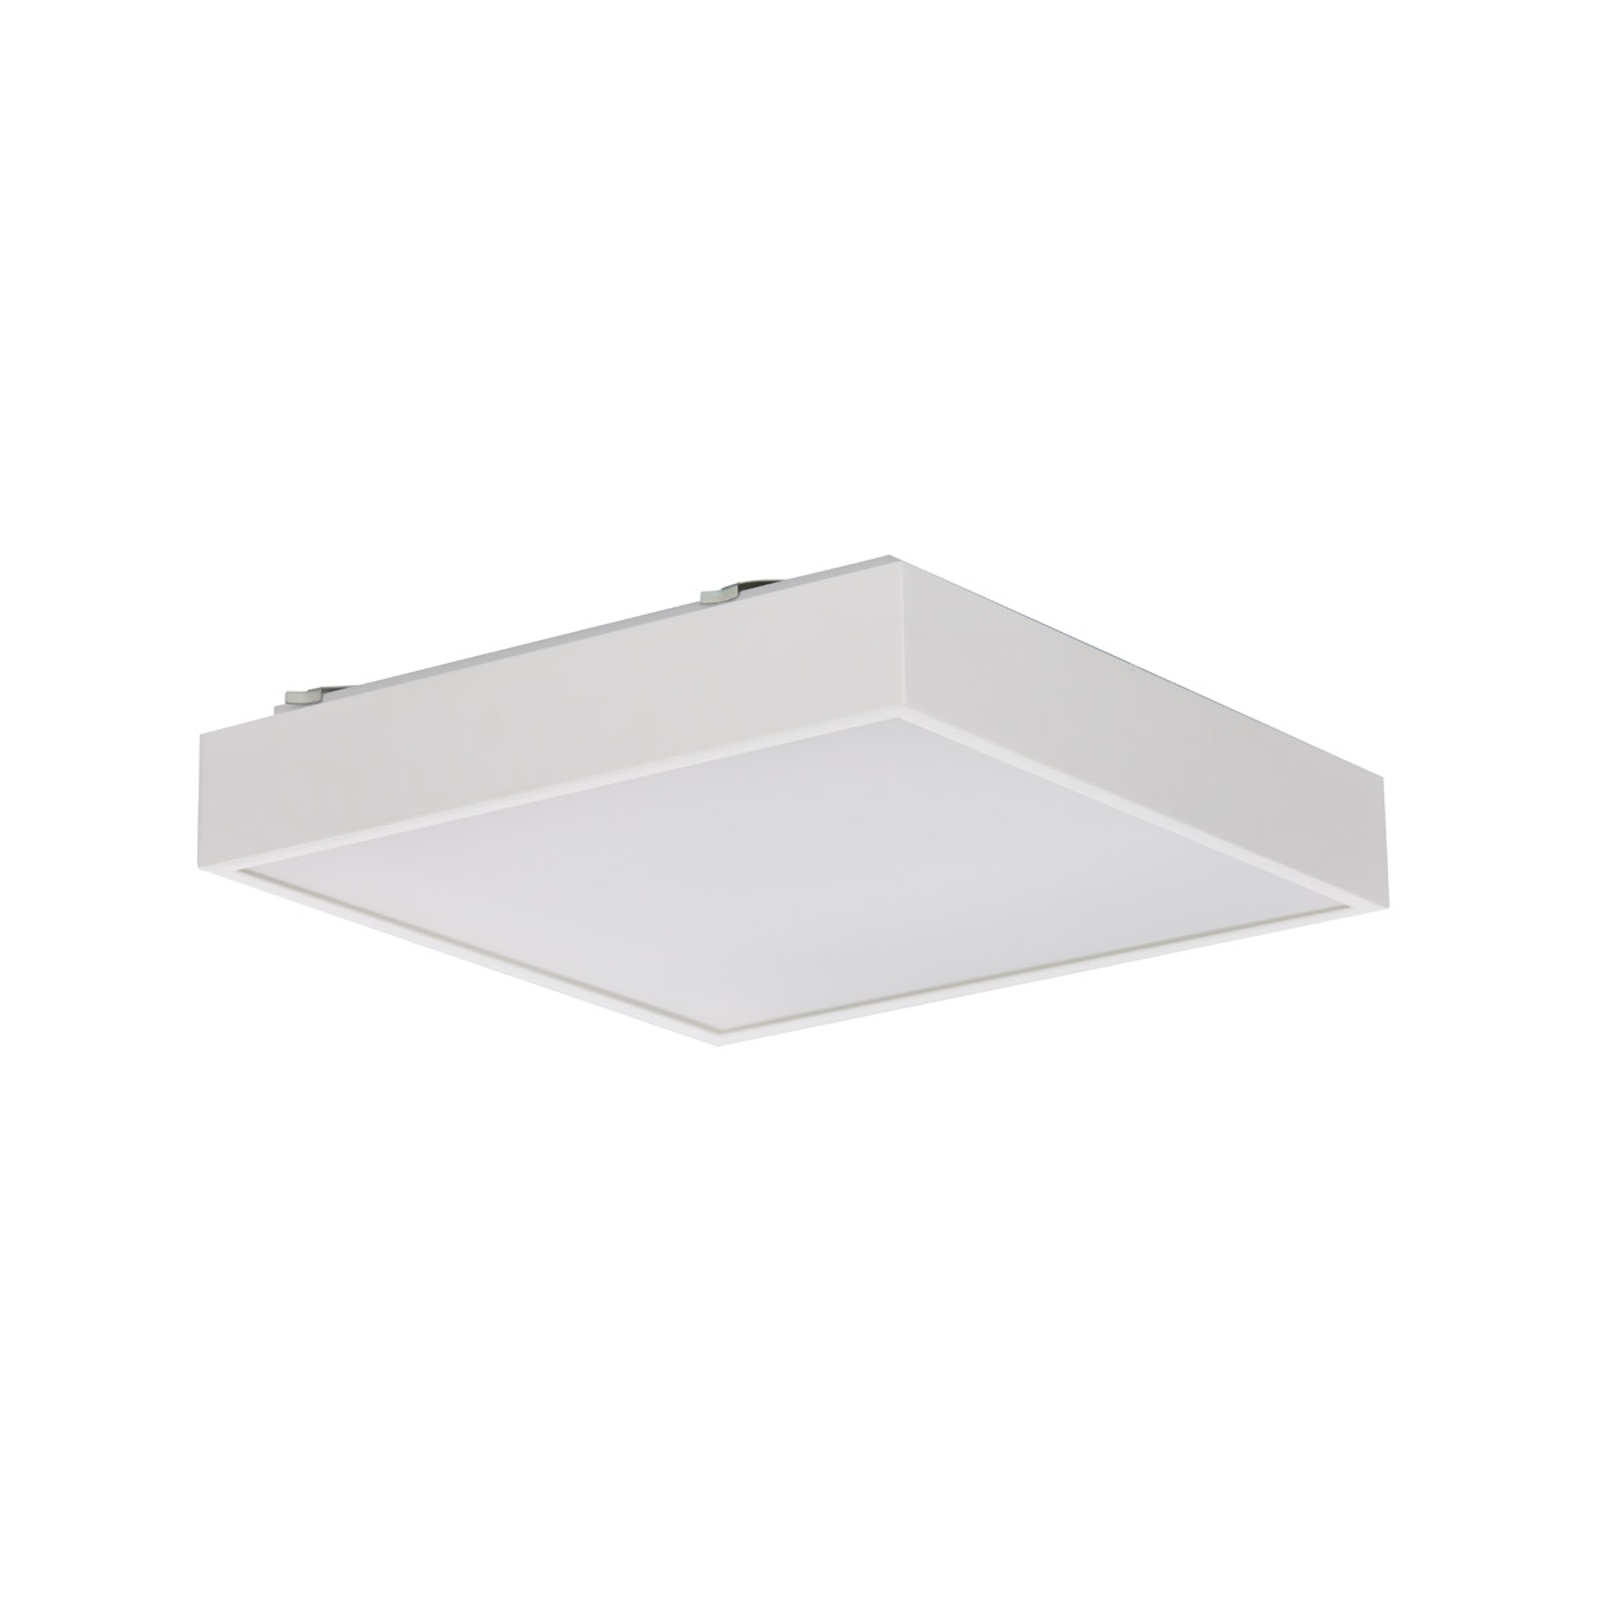 Q4 - led-plafondlamp, wit, DALI